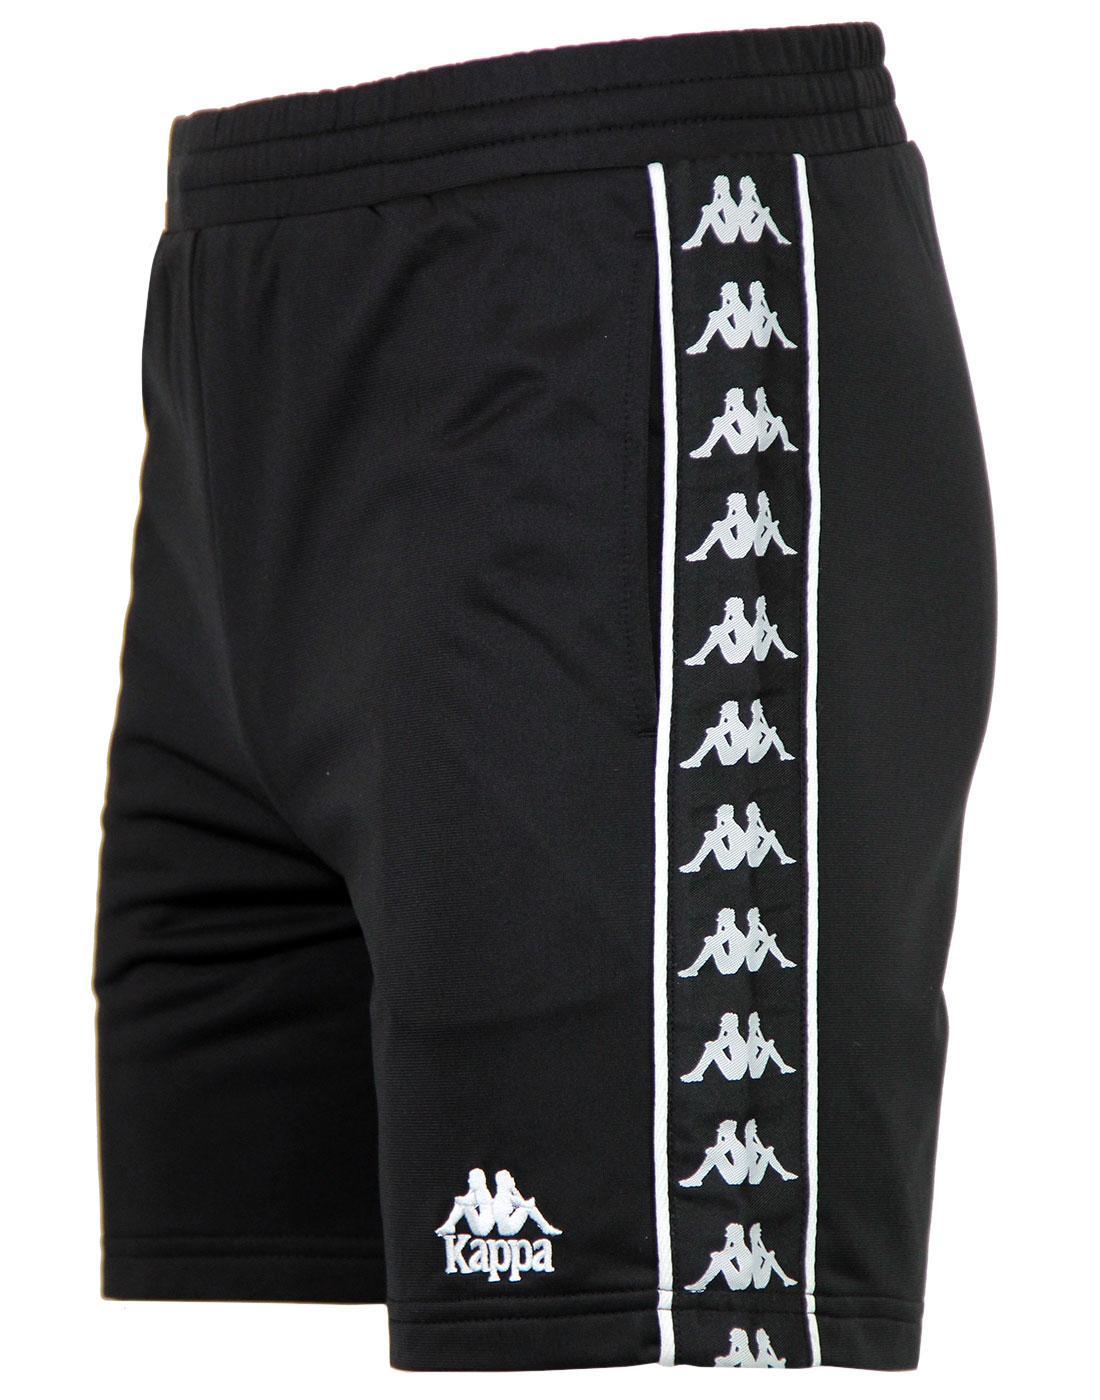 Cole KAPPA Men's Retro Seventies Football Shorts